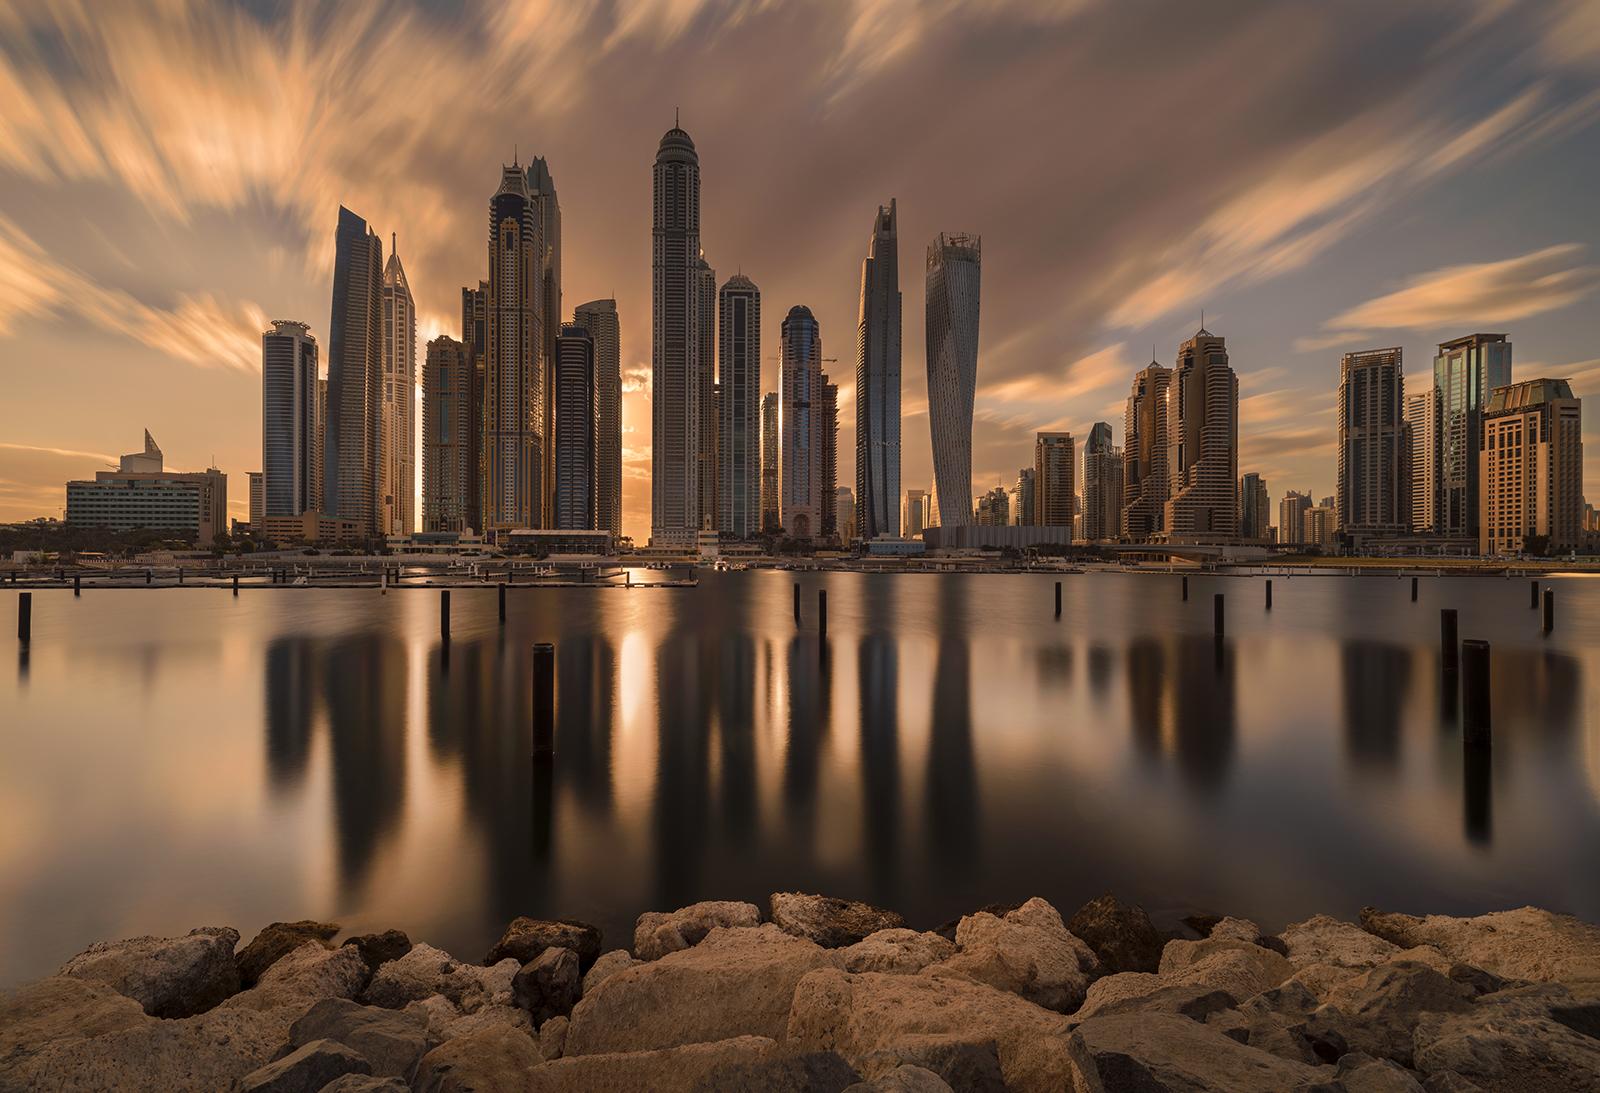 Dubai Marina Yach club